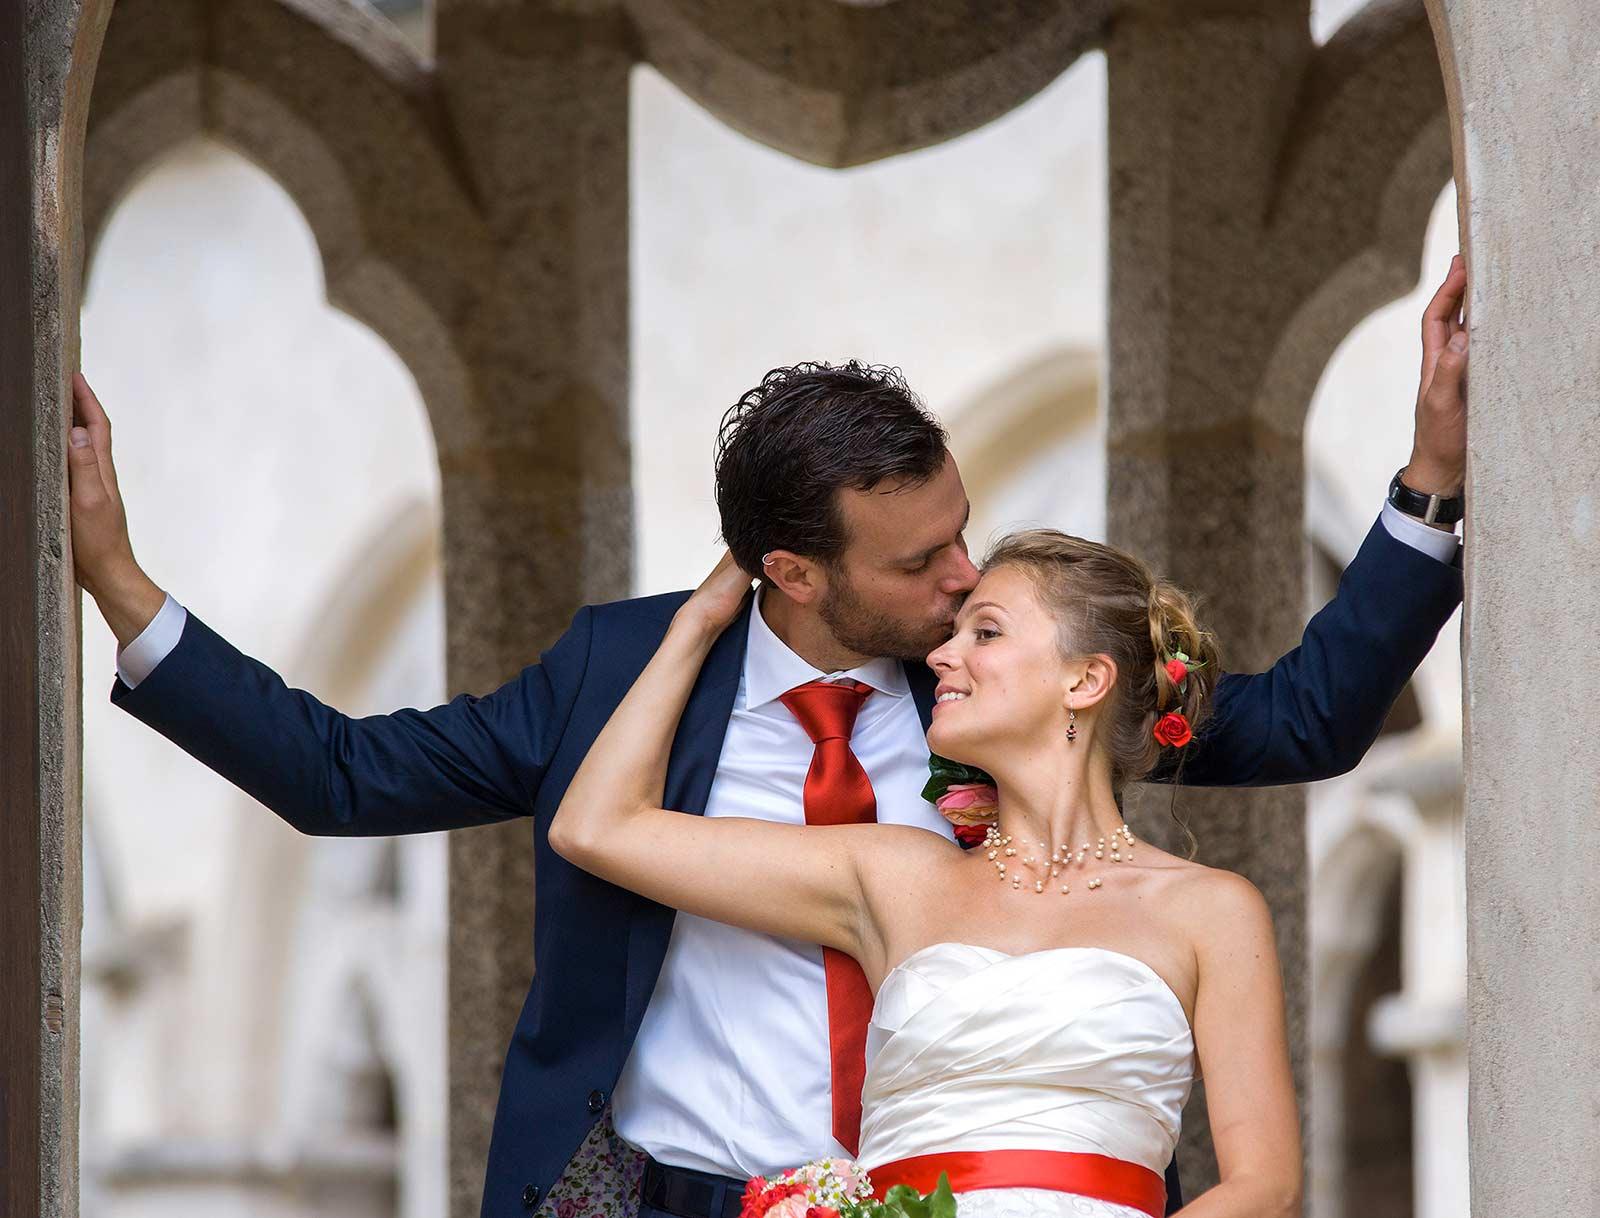 17 svatebni foto zenich a nevesta svatebni fotograf ales motejl jihocesky kraj